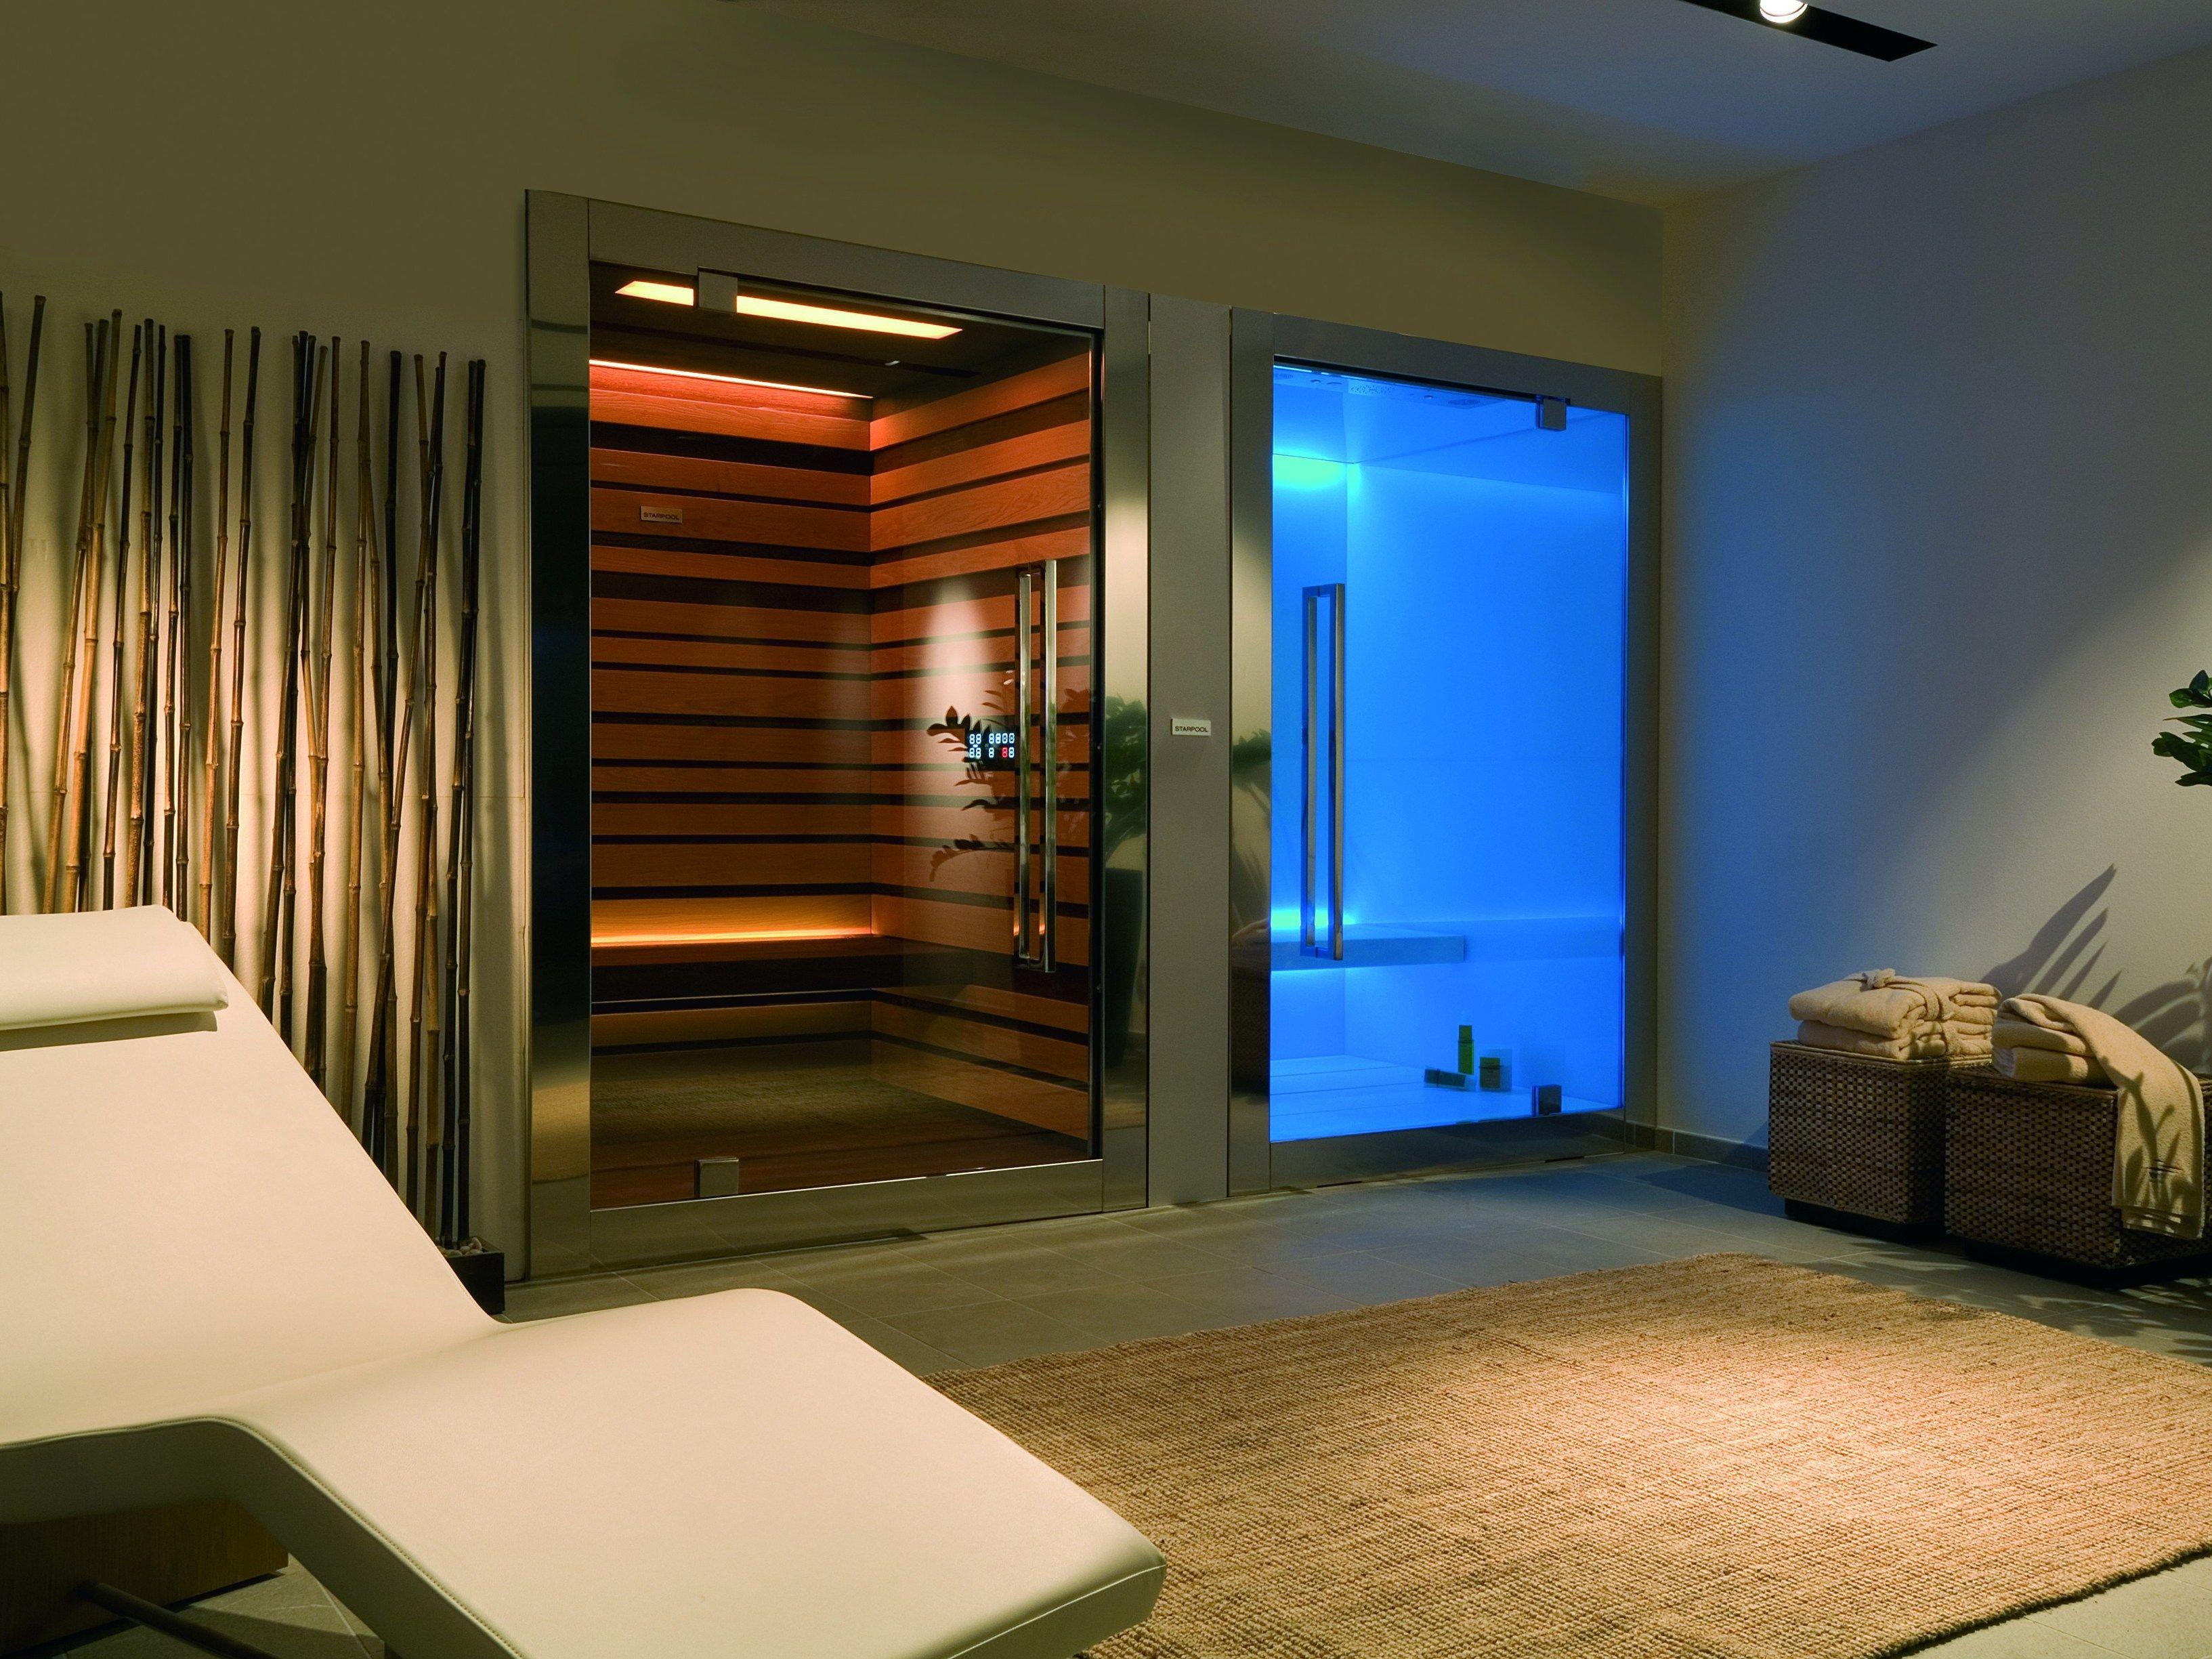 Sauna hammam sweet spa e sweet sauna by starpool design - Que es un spa ...